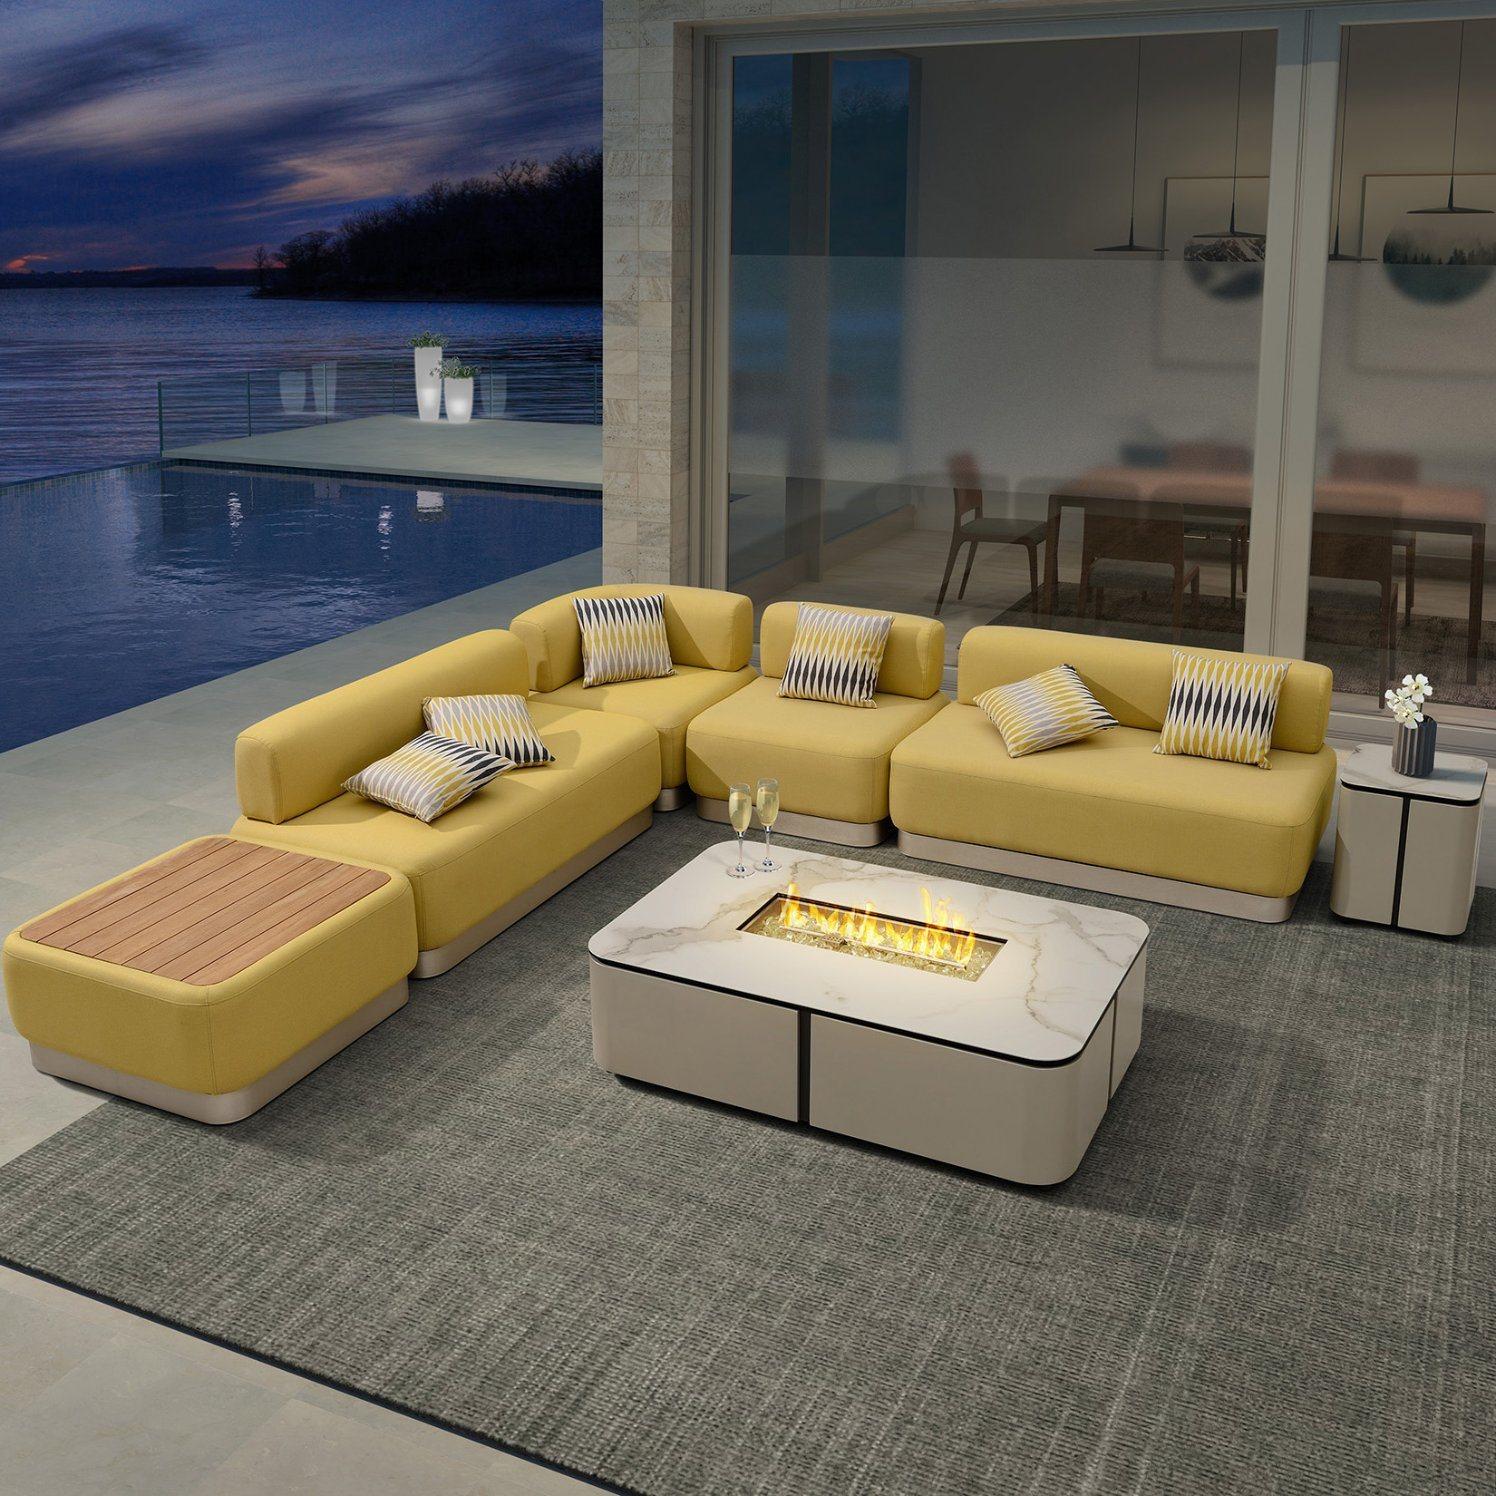 [Hot Item] Garden Furniture Patio Luxury Outdoor Modular Sofa for Hotel